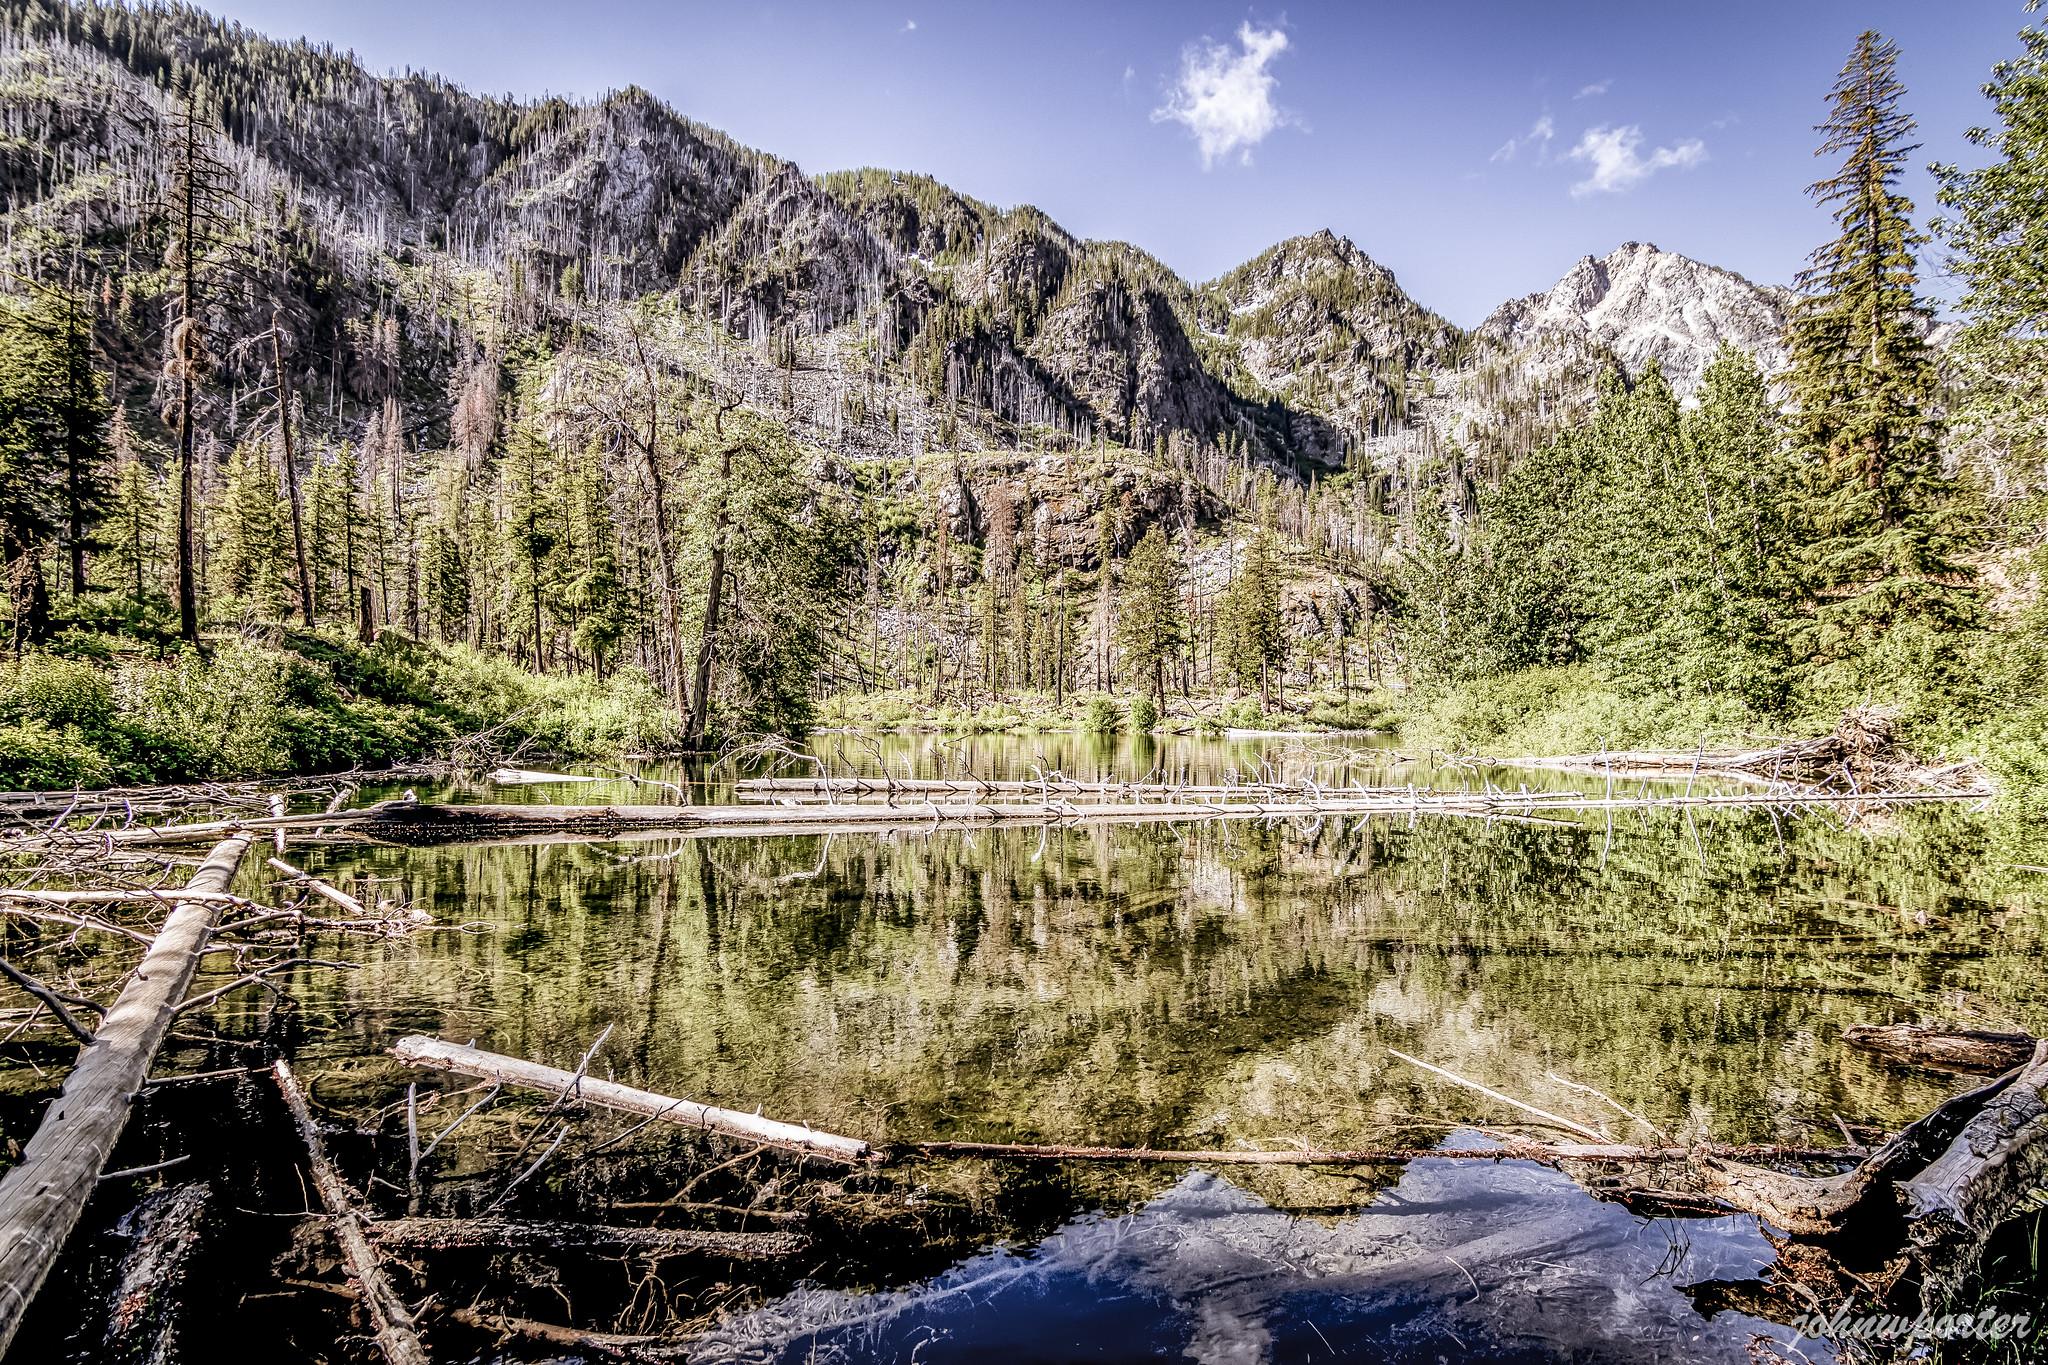 Little Eightmile Lake